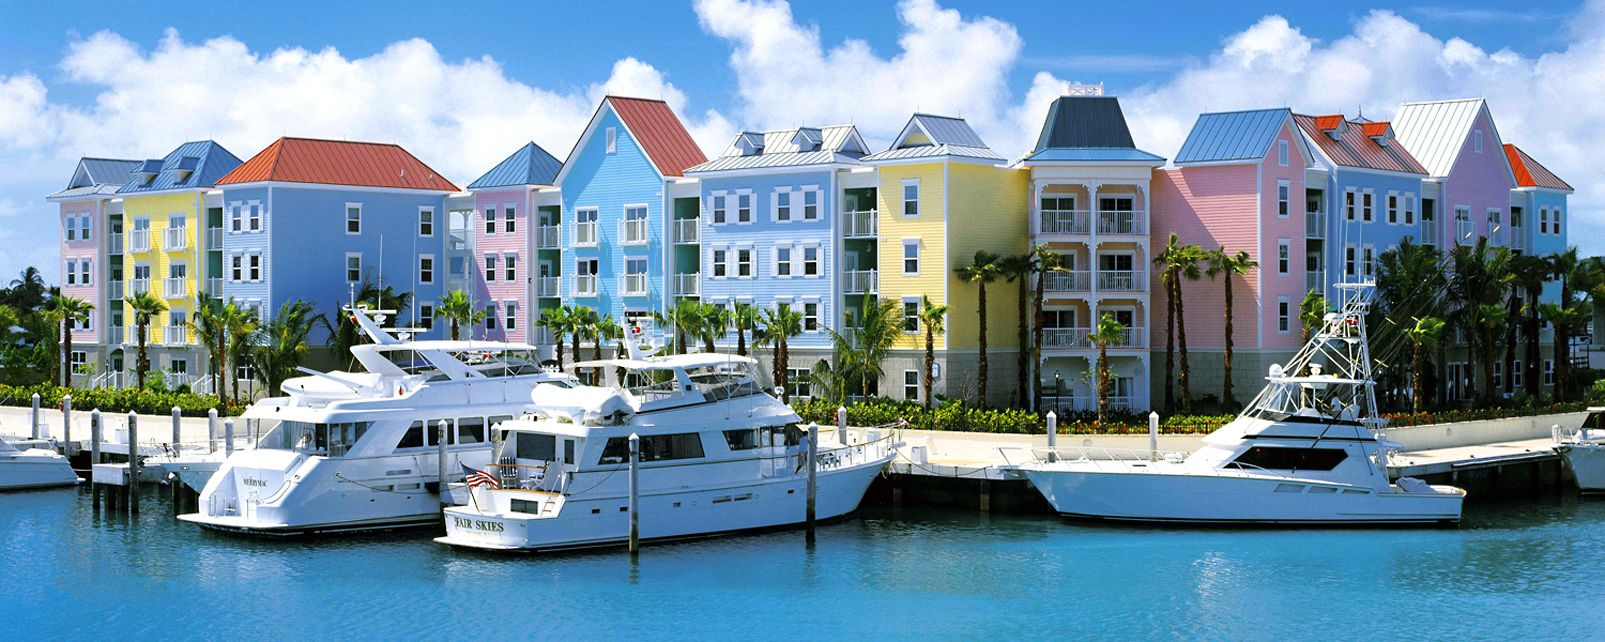 Hôtel Atlantis - Bahamas